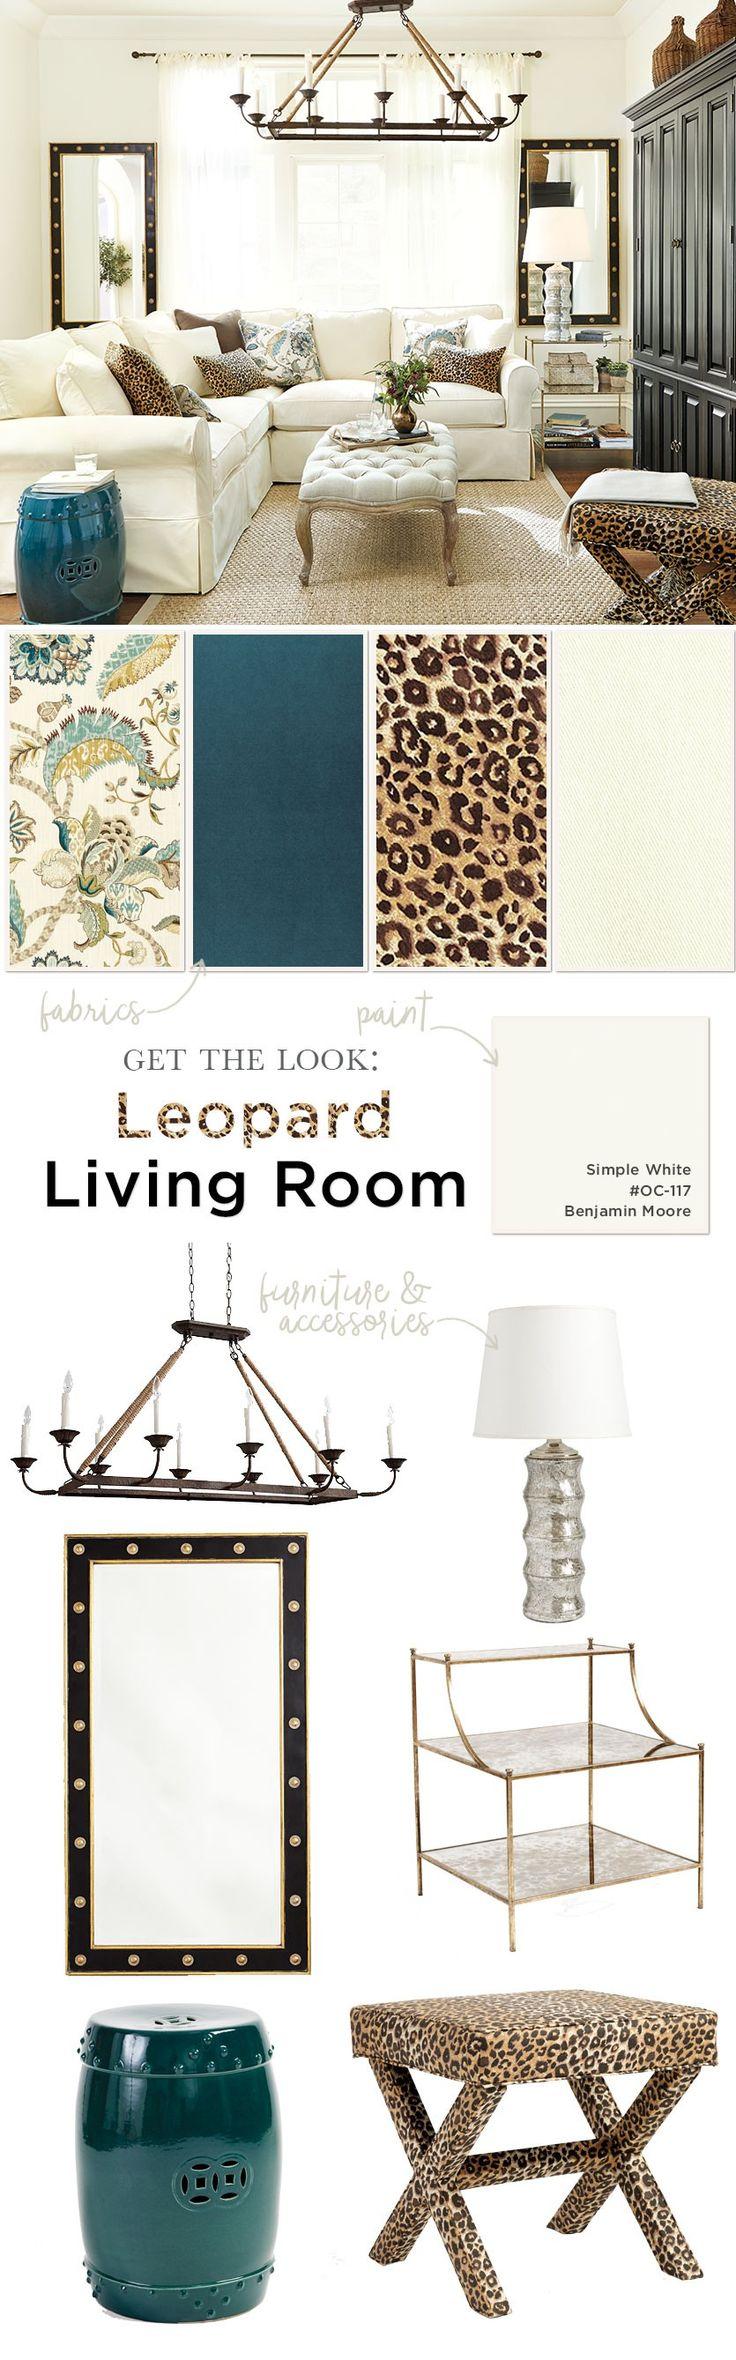 M s de 25 ideas incre bles sobre sala de leopardo en for Decoracion hogar leopardo